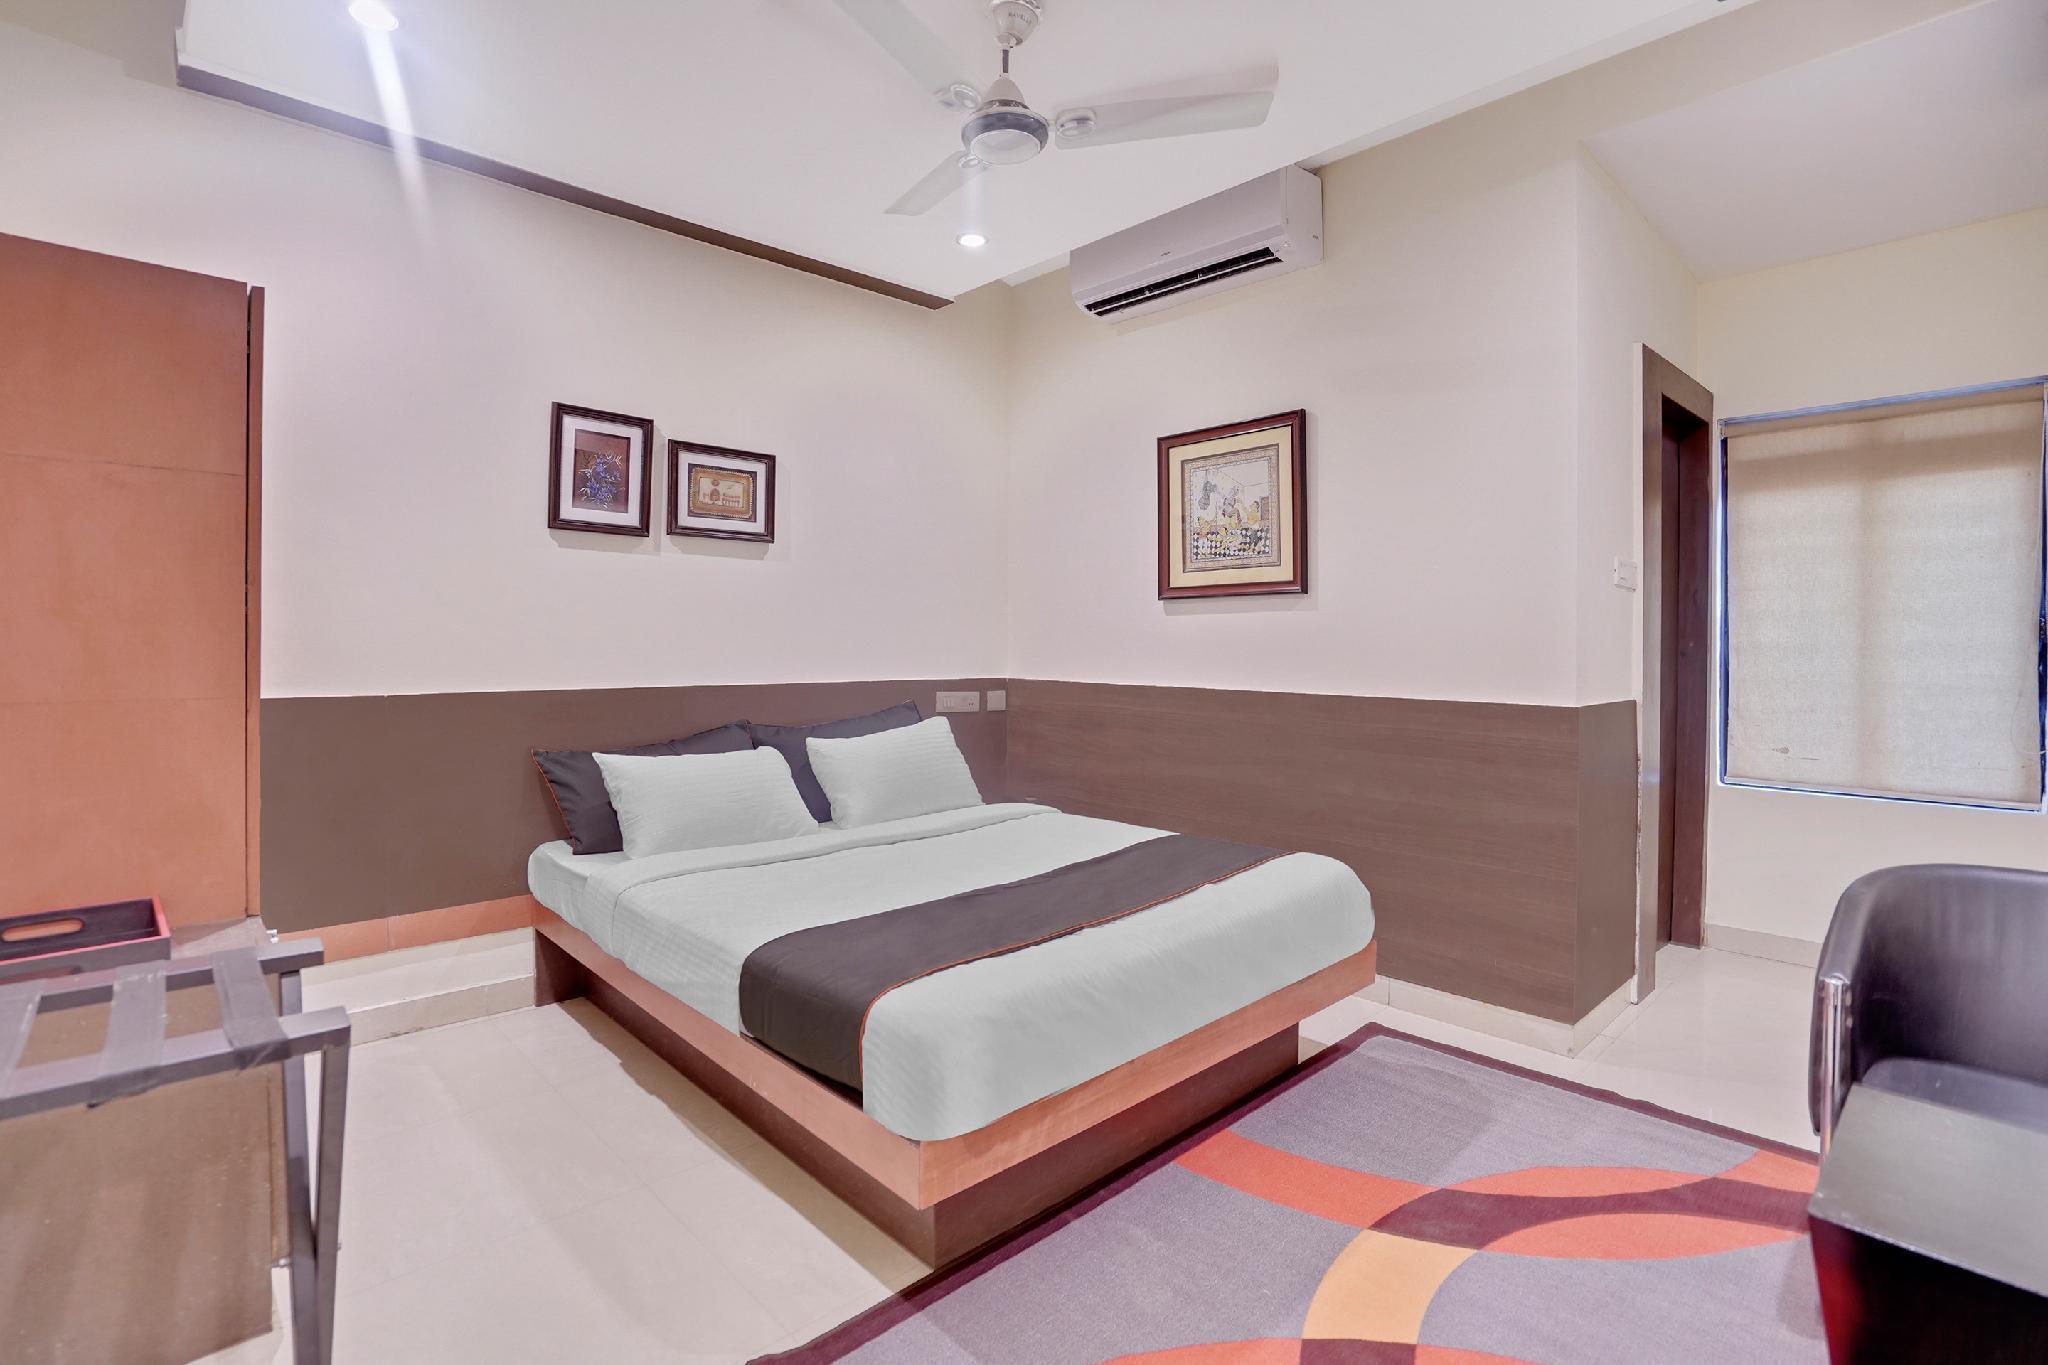 Collection O 30111 Hotel Miland Palace Cuttak Rd